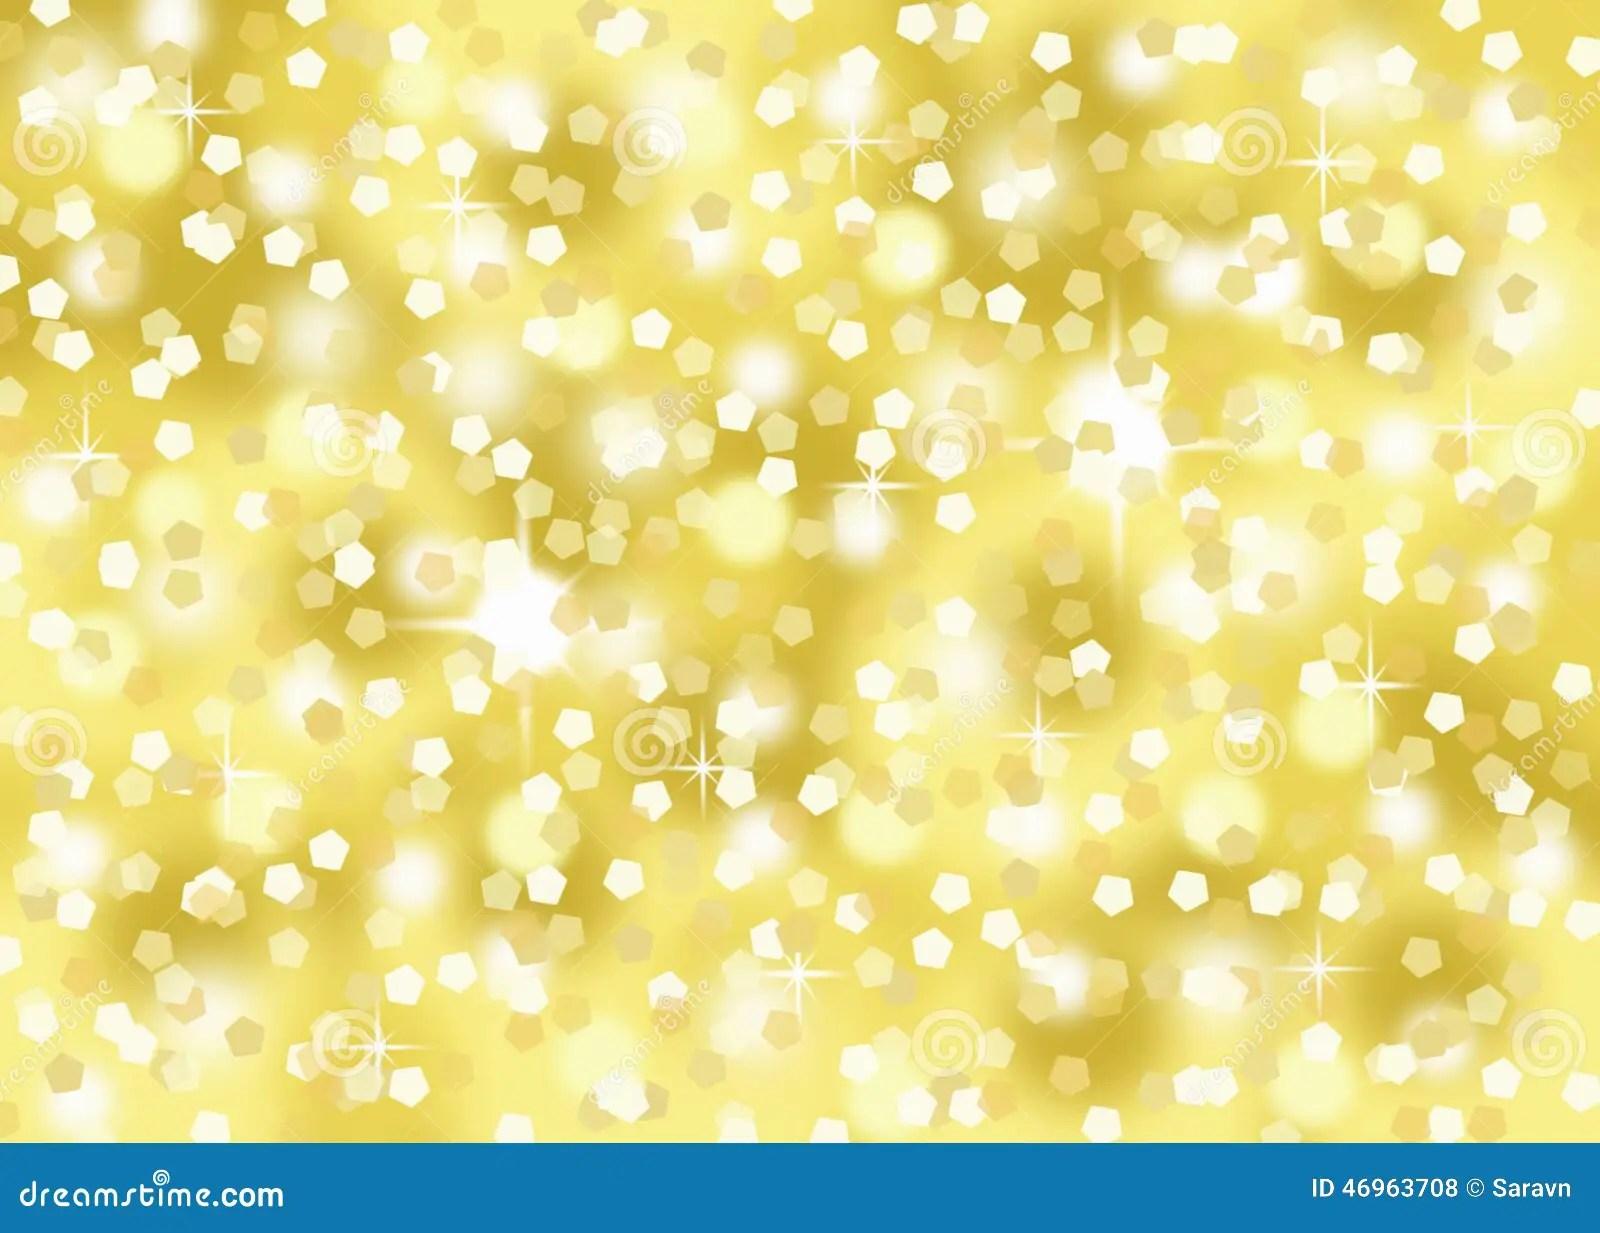 stock illustration gold confetti glitter holiday festive celebration abstract bokeh background sparkles